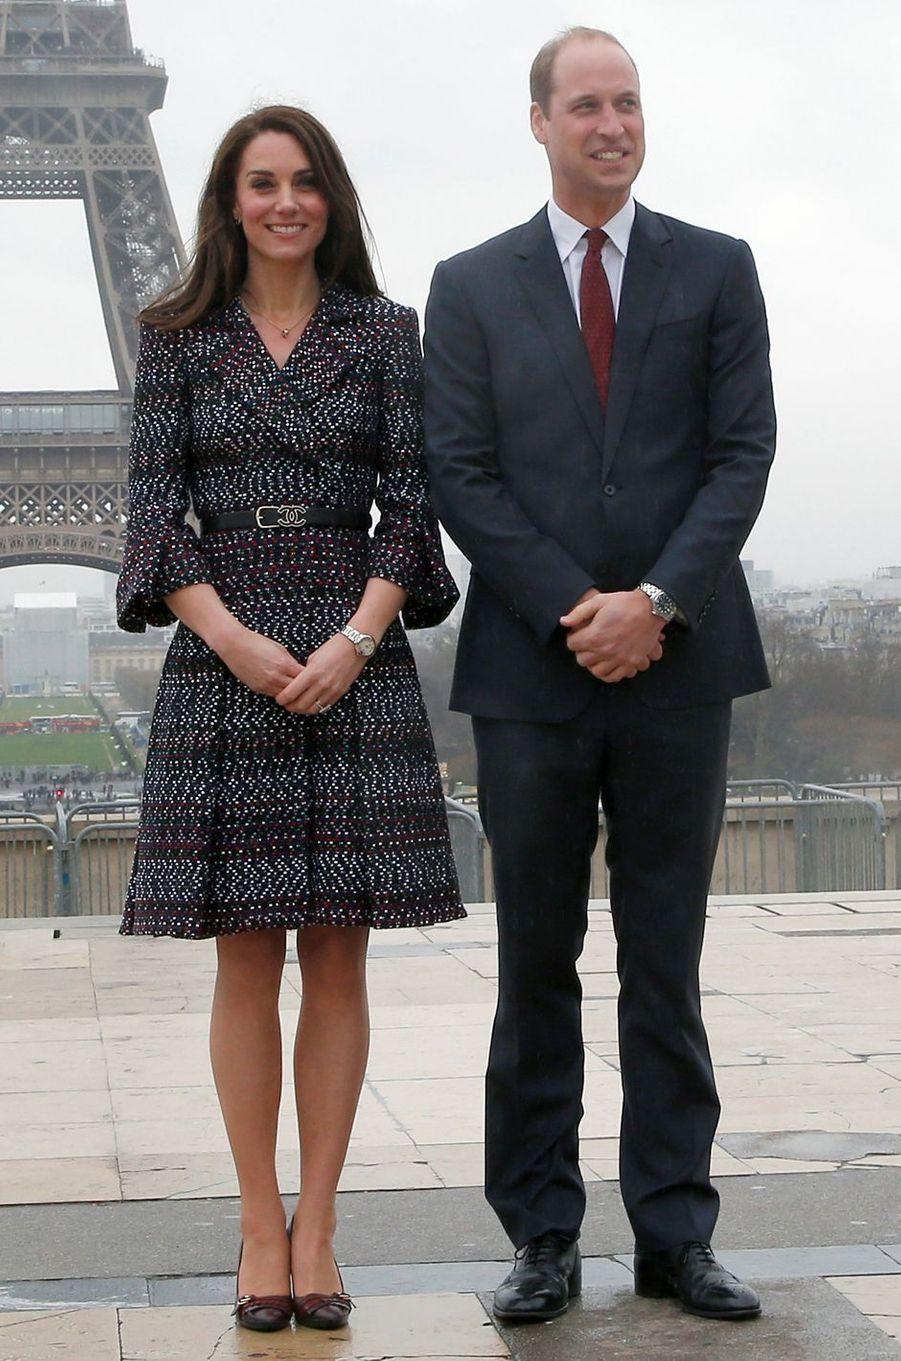 La duchesse Catherine de Cambridge en Chanel, le 18 mars 2017